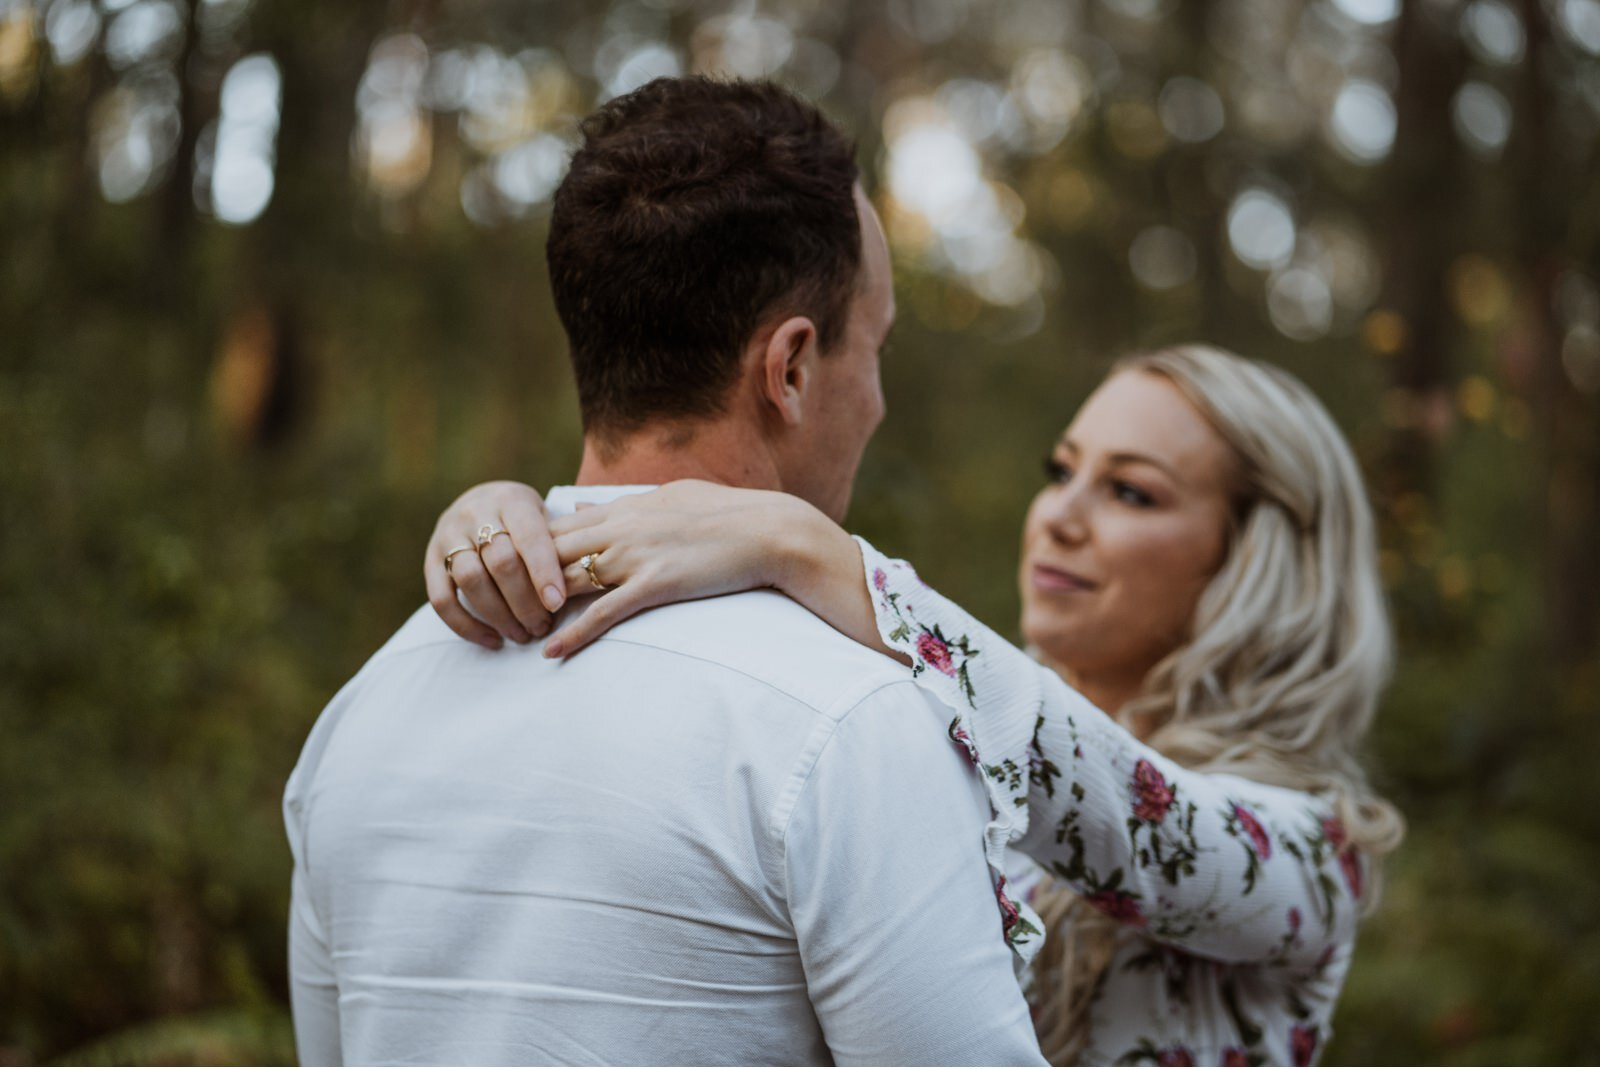 newcastle-wedding-photographer-dudley-engagement-shoot-2.jpg